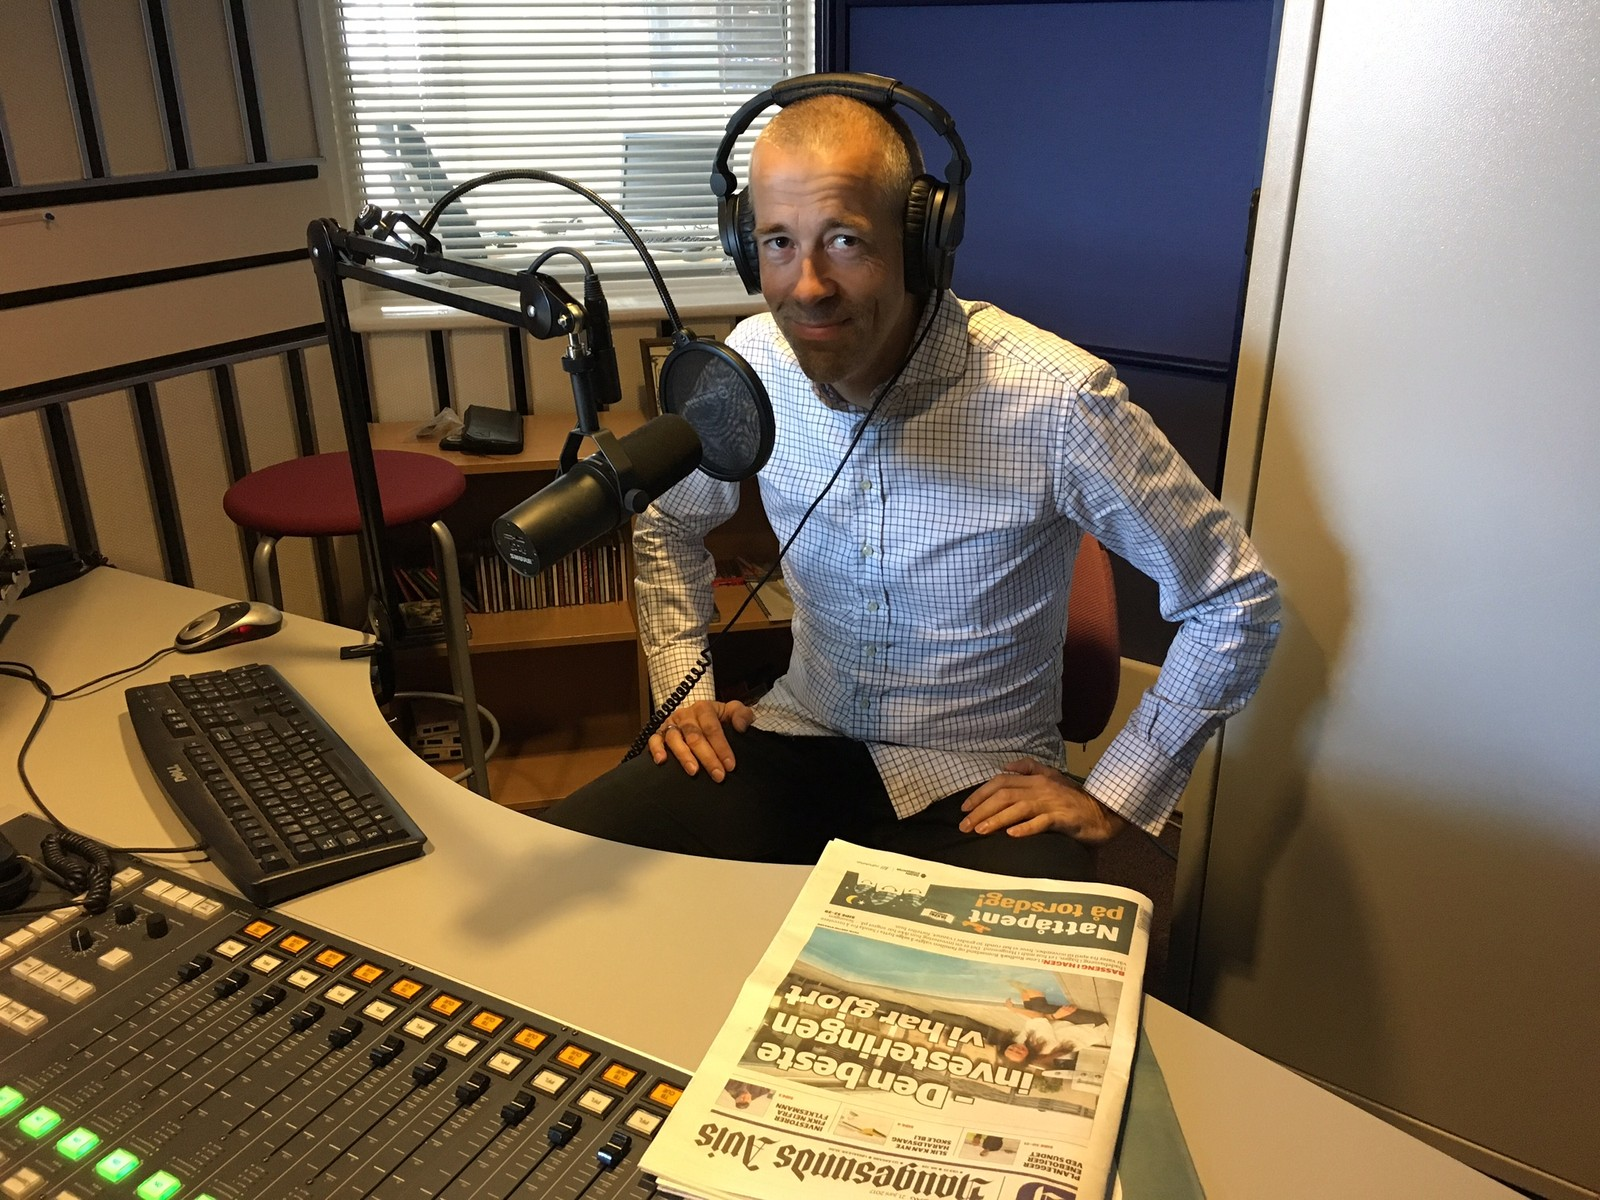 Einar Tho, sjefredaktør Haugesunds avis